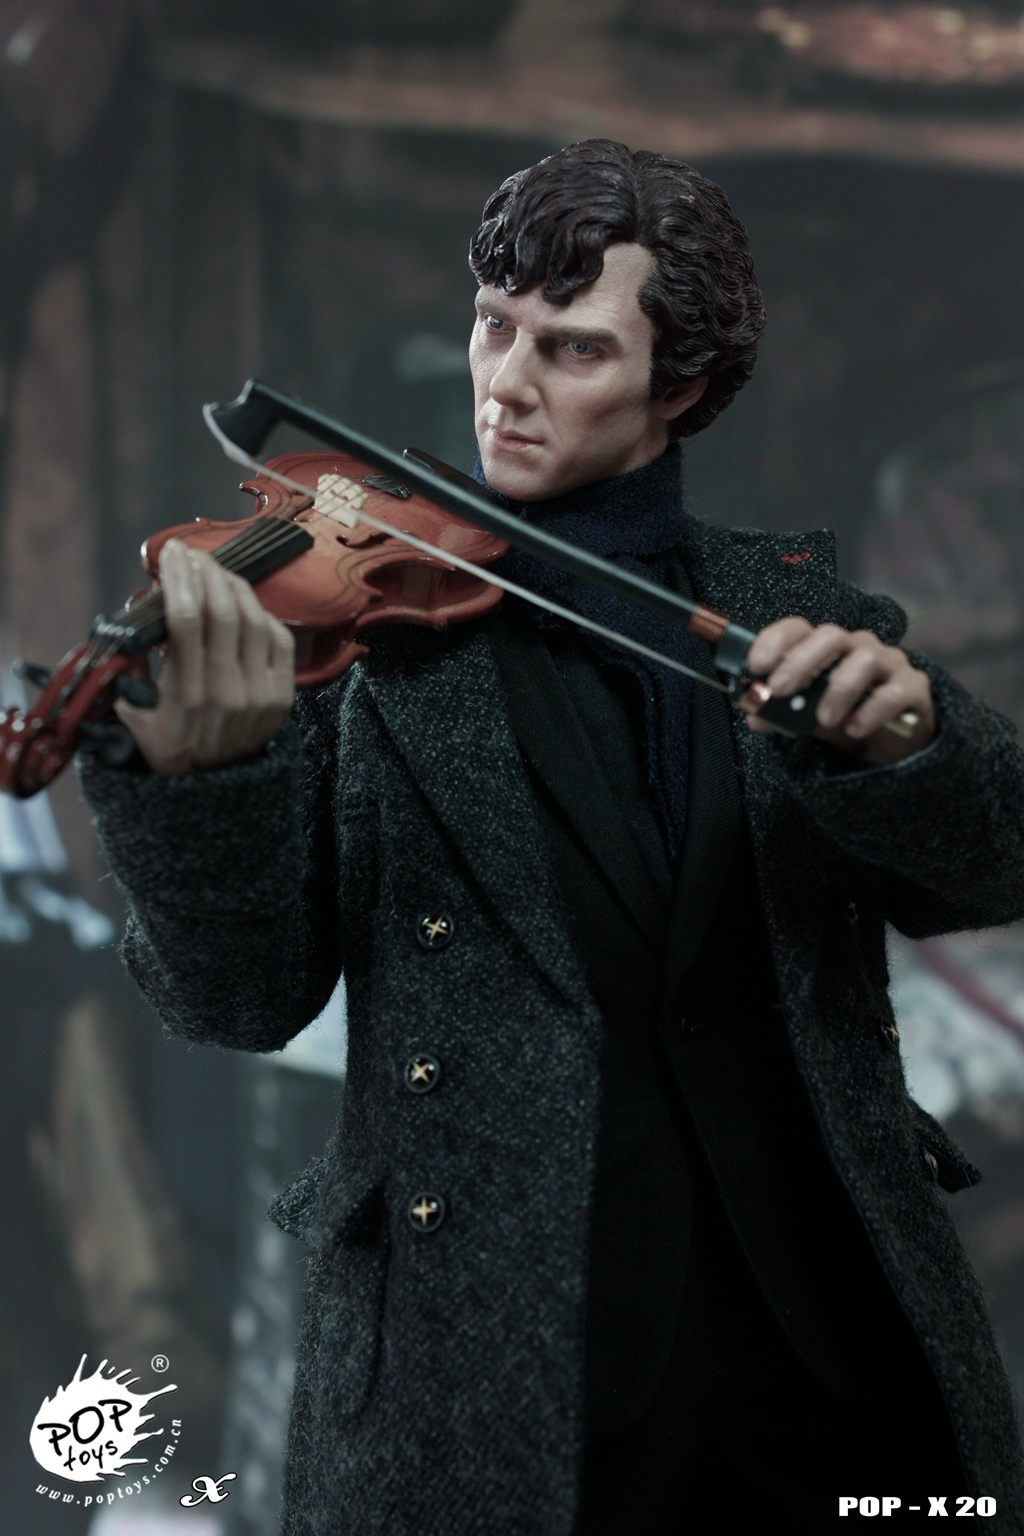 [Pop Toys] Sherlock 1/6 scale 102526bzkmyy1yk33uokmk